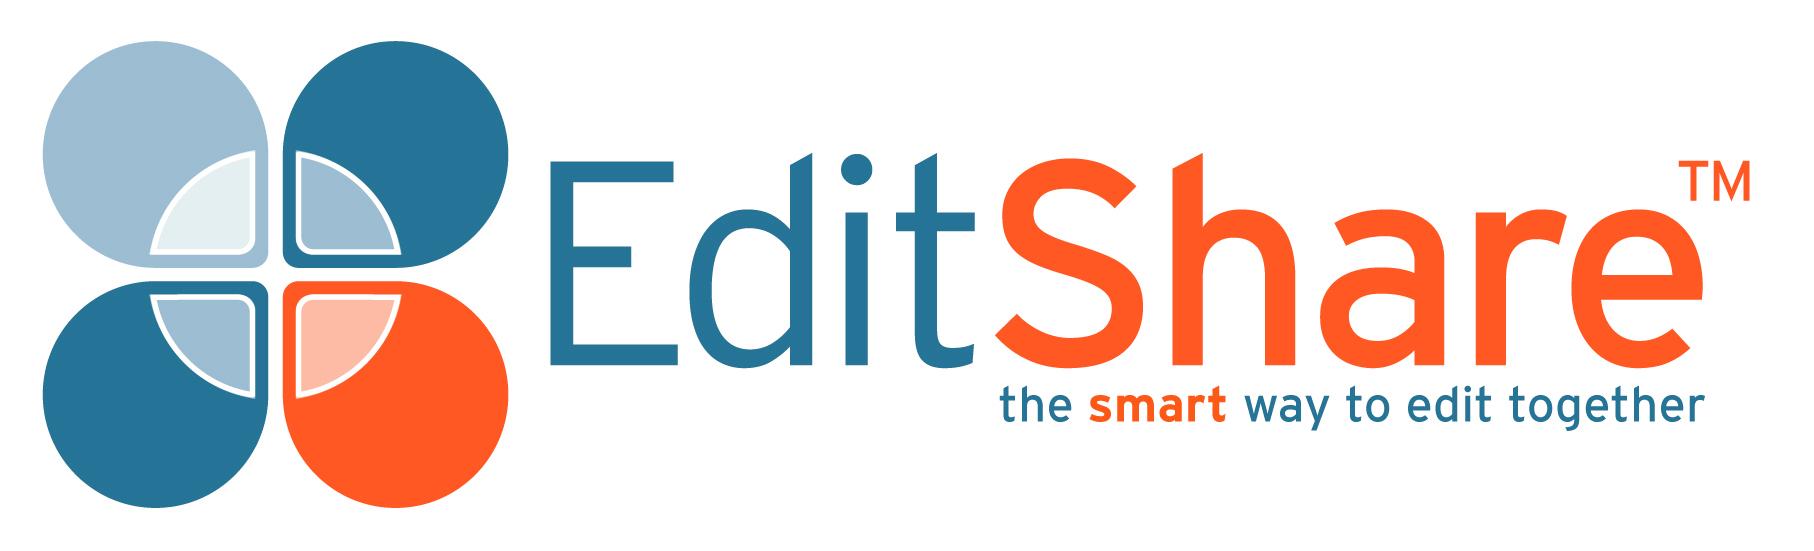 editshare-logo.png